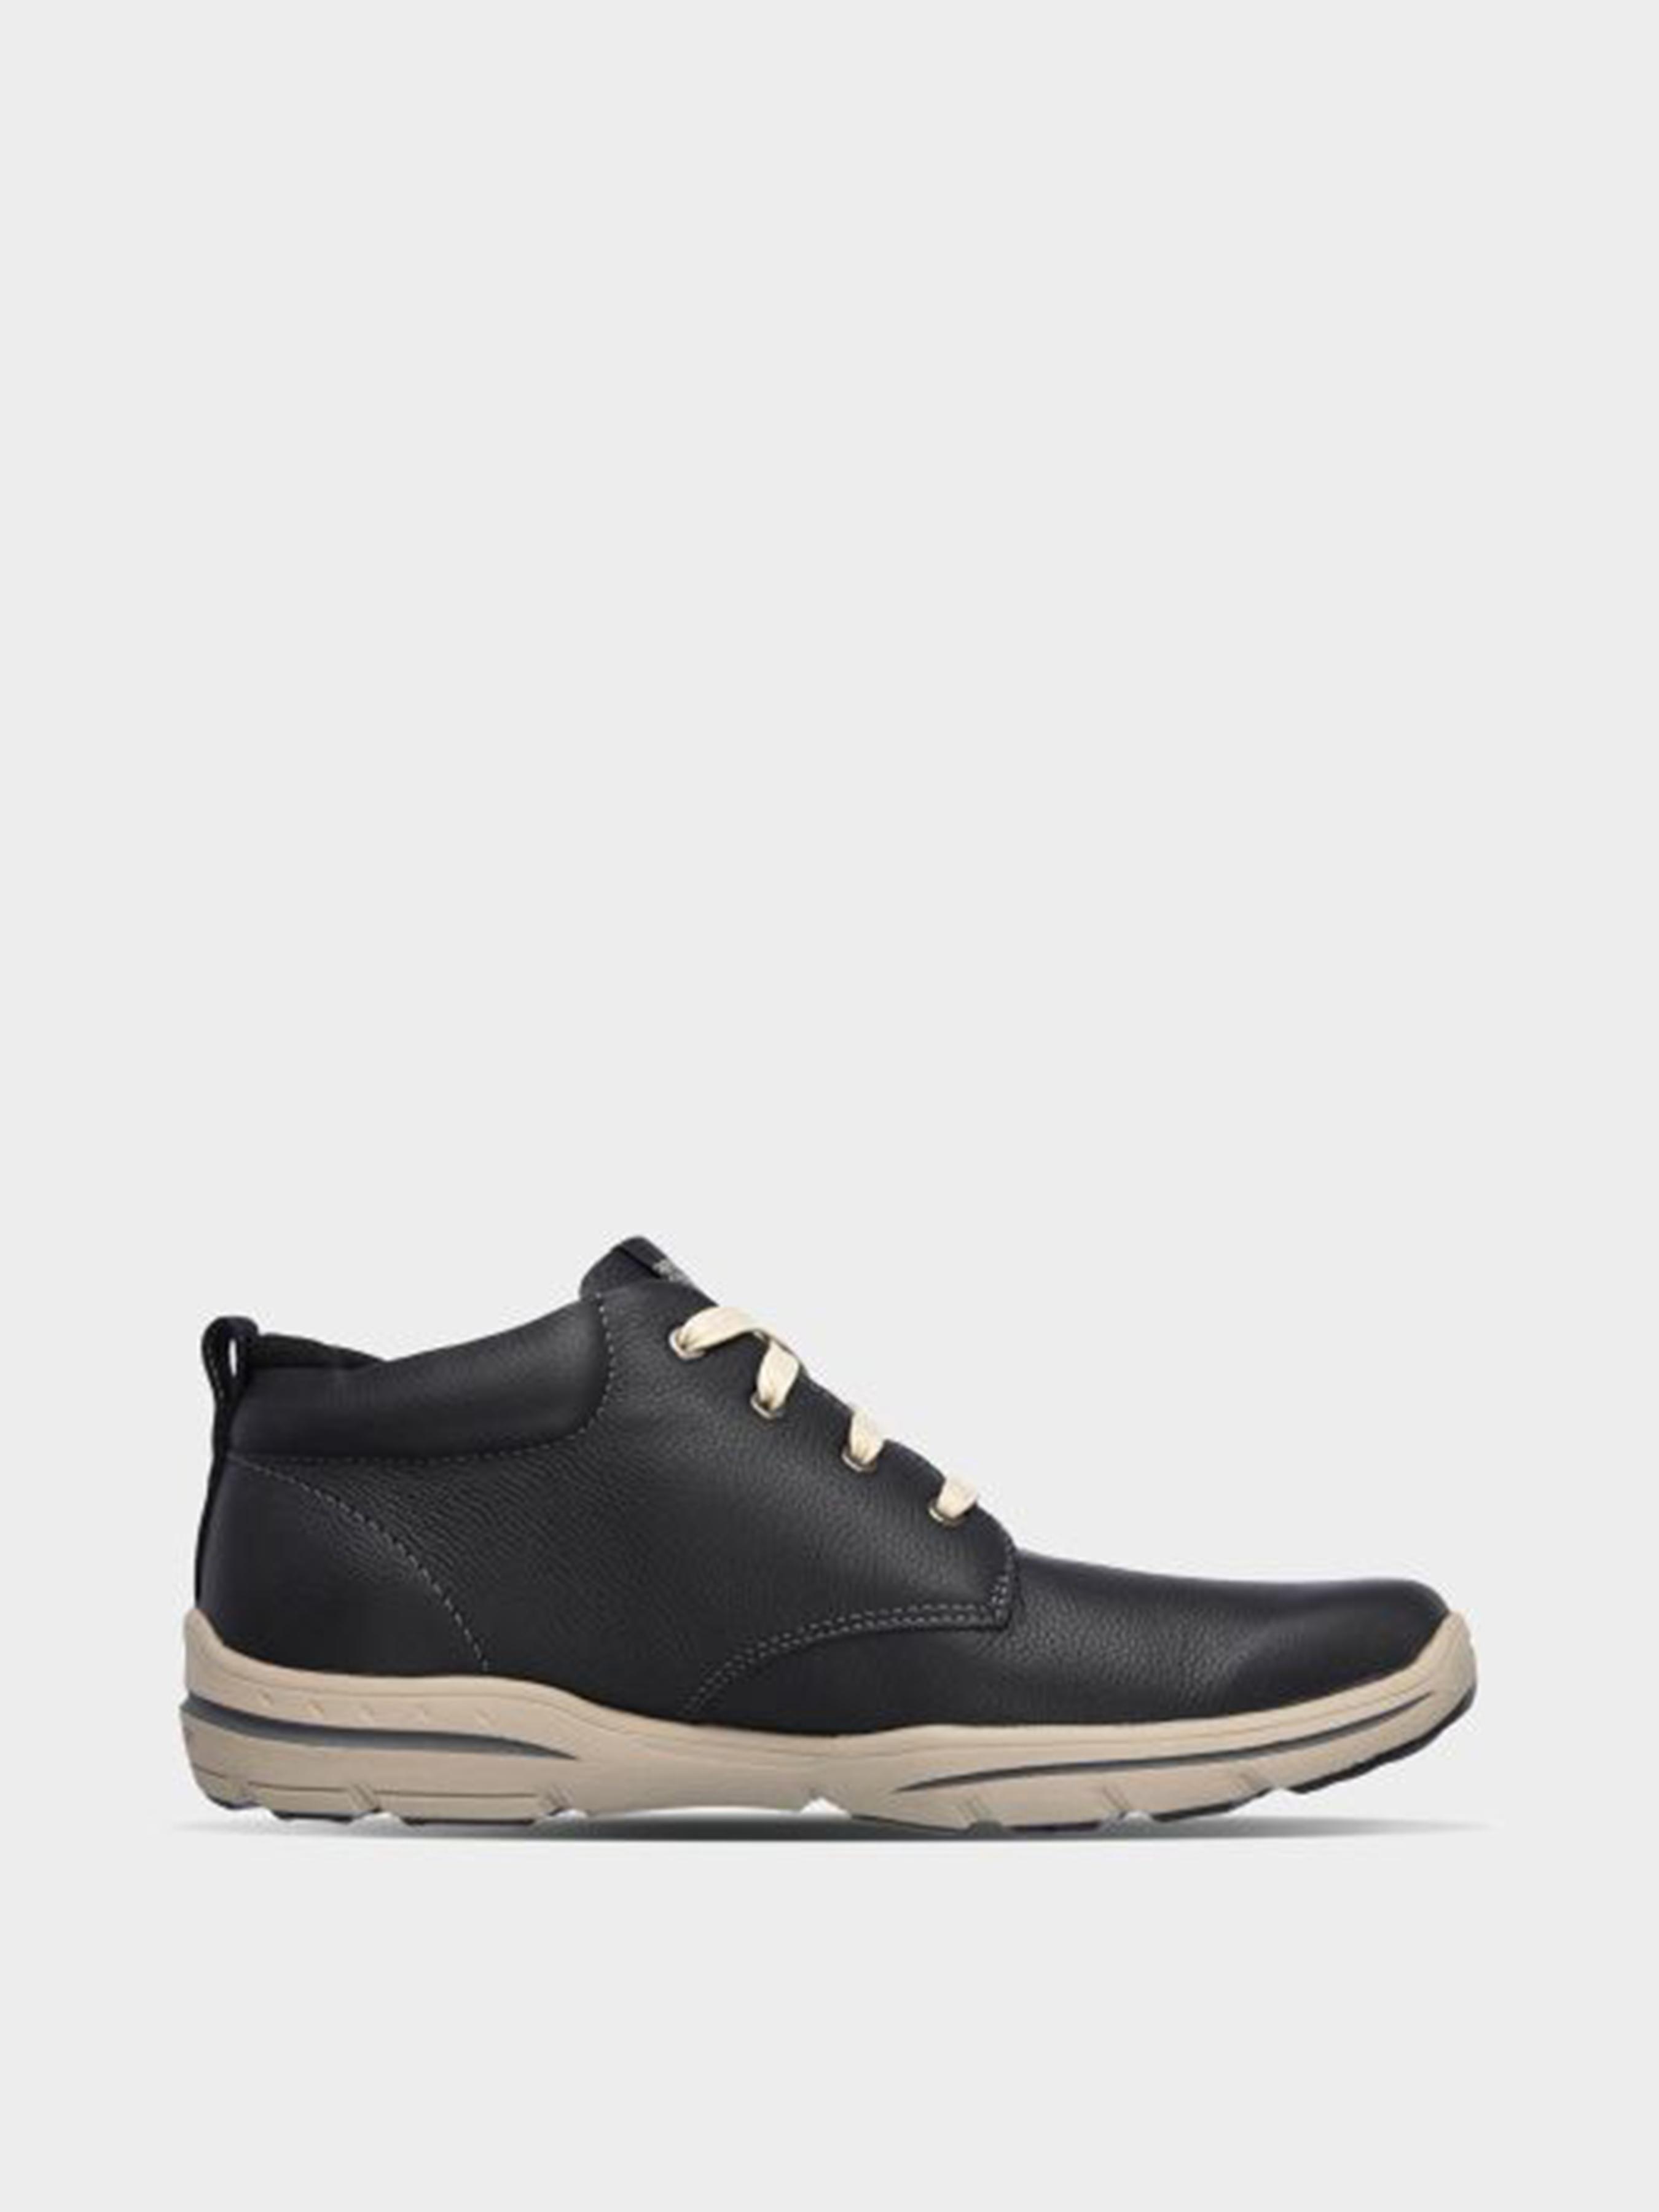 Полуботинки для мужчин Skechers KM2492 модная обувь, 2017